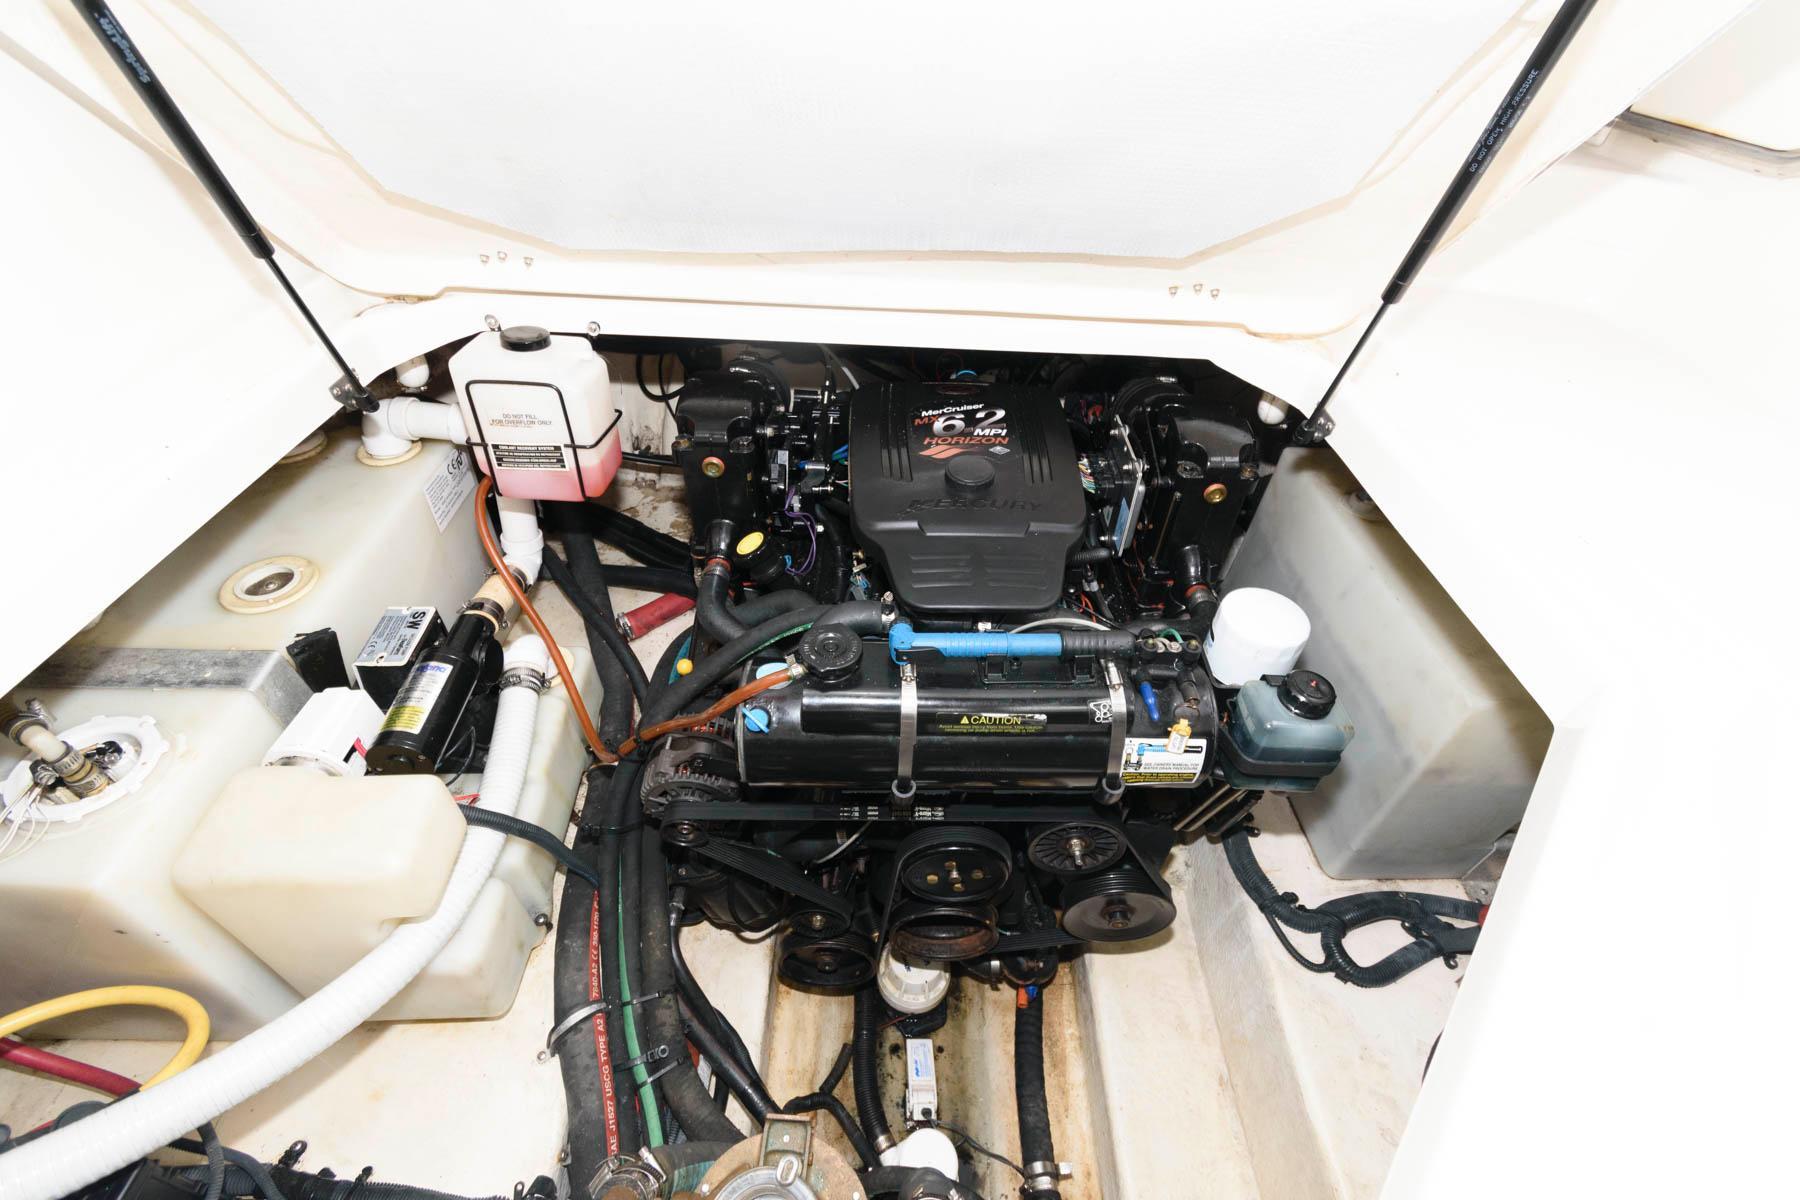 M 6259 BW Knot 10 Yacht Sales